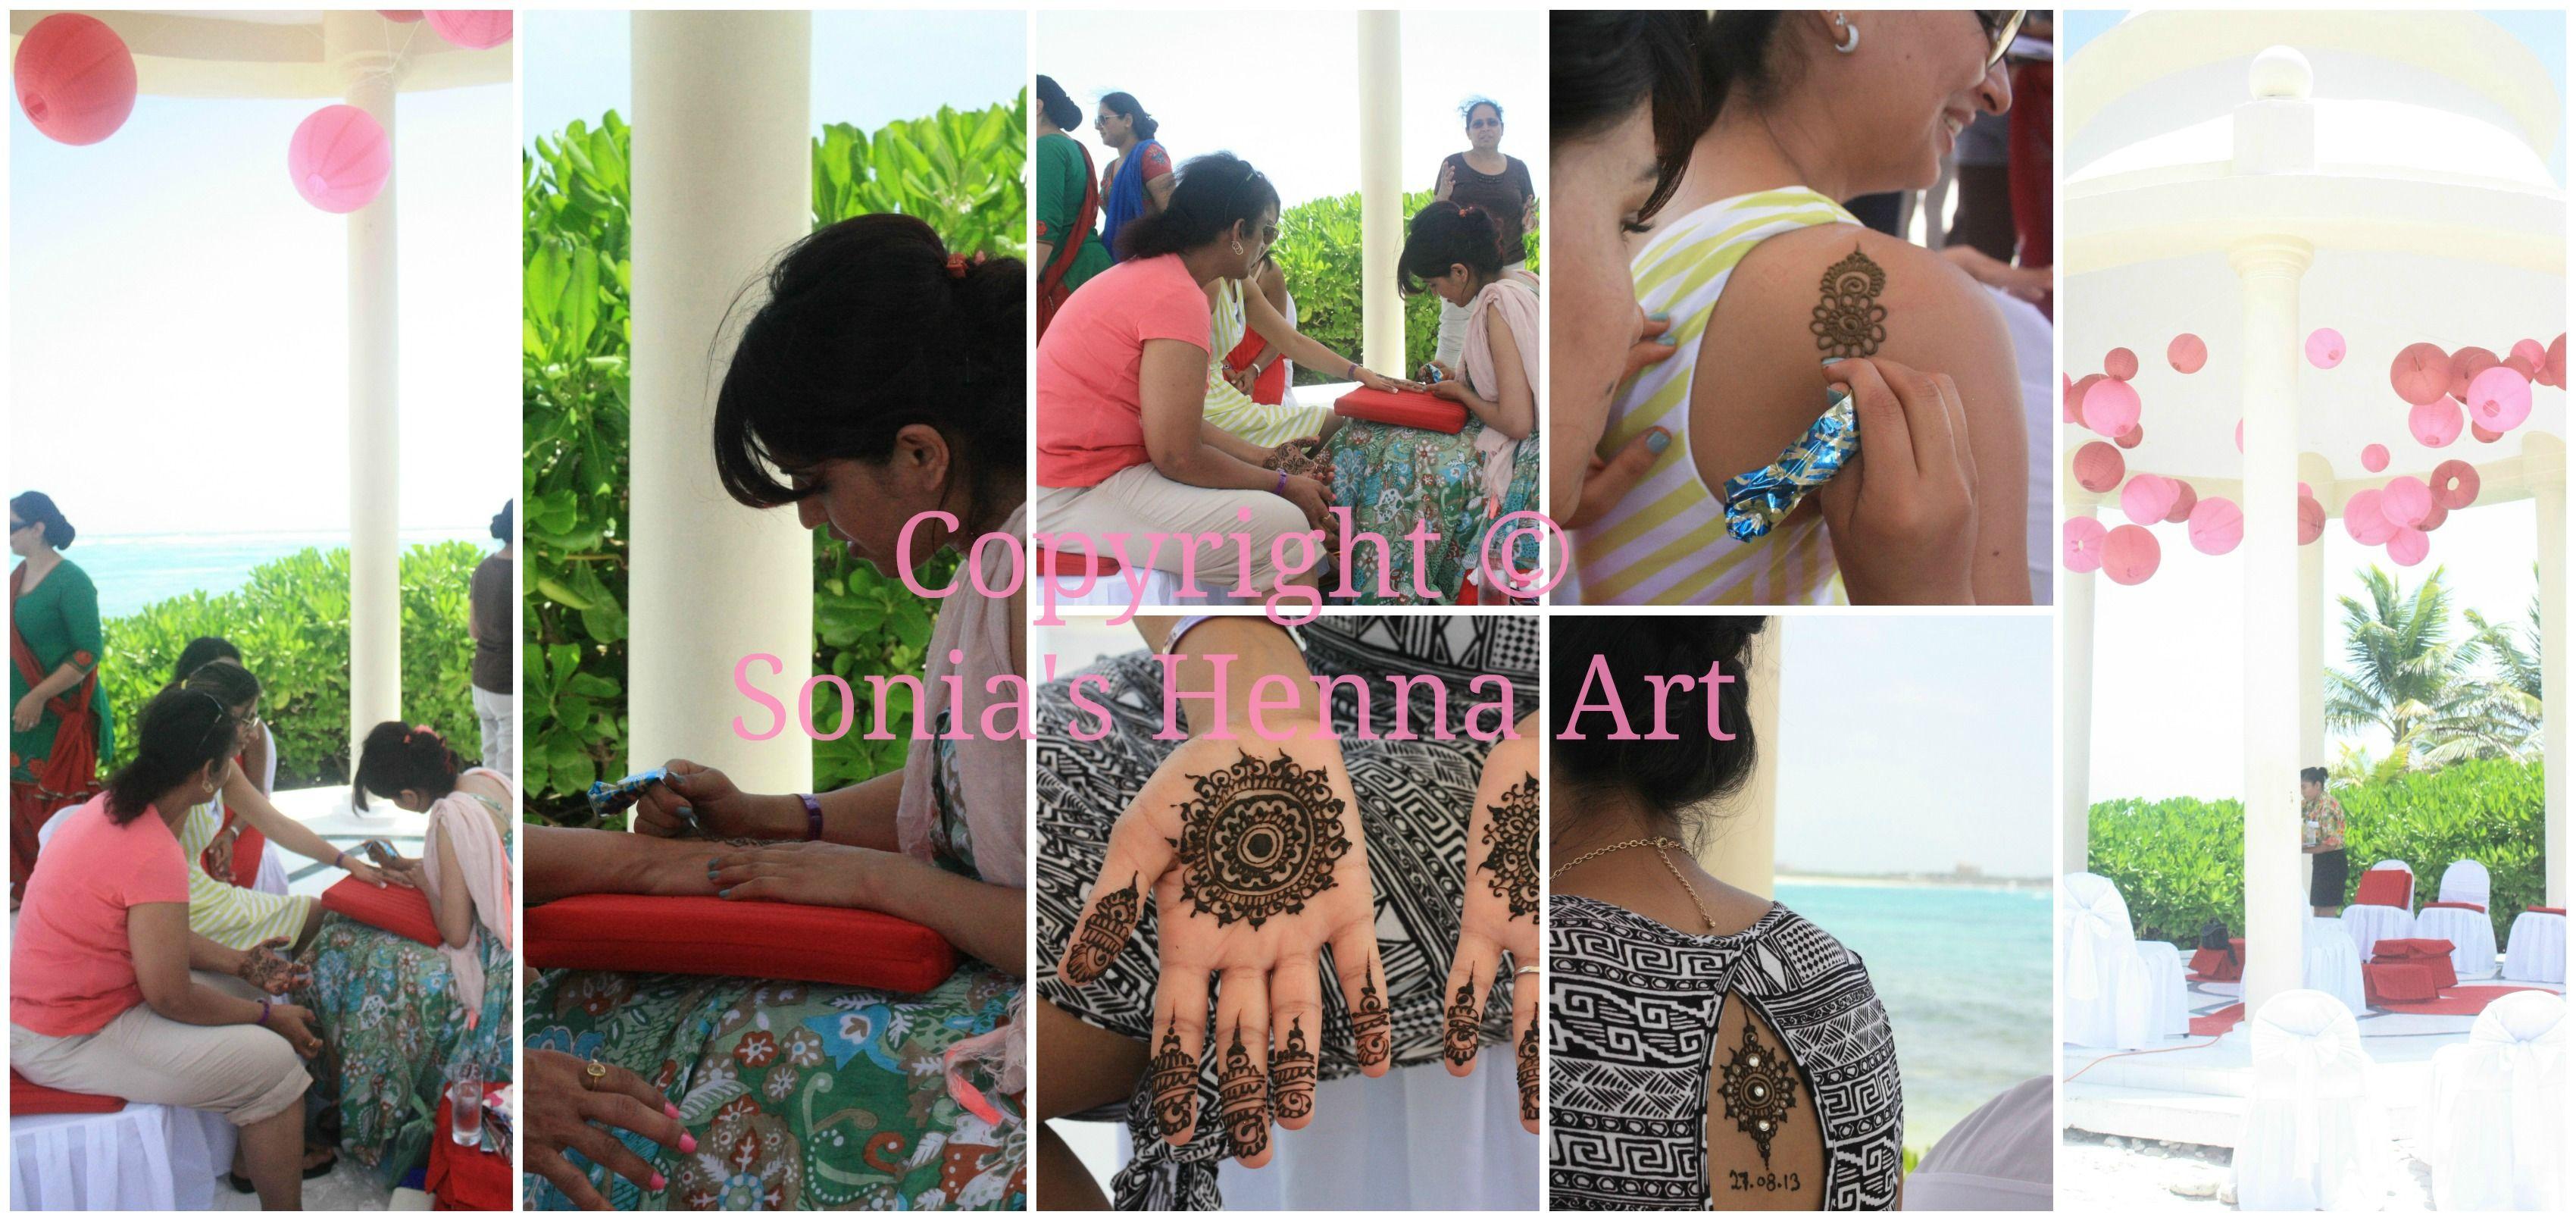 Copyright © Sonia's Henna Art Bridal, MEXICO  destination wedding 2013, henna artist, desi, bridal, shadi, bridal henna , bridal, Henna Designs, mehndi service in toronto, Scarborough, destination wedding, henna artist,henna tattoo, bridal mehndi, south asian mehndi, Indian Traditional Henna, Bridal henna, Mehindi, Mahndi, Heena, mehndi artist, glitter, Free henna,Pakistani style mehndi, arabic mehndi, cheap henna in toronto, low price of henna, mehandi, design, new, art, Indian weddings,